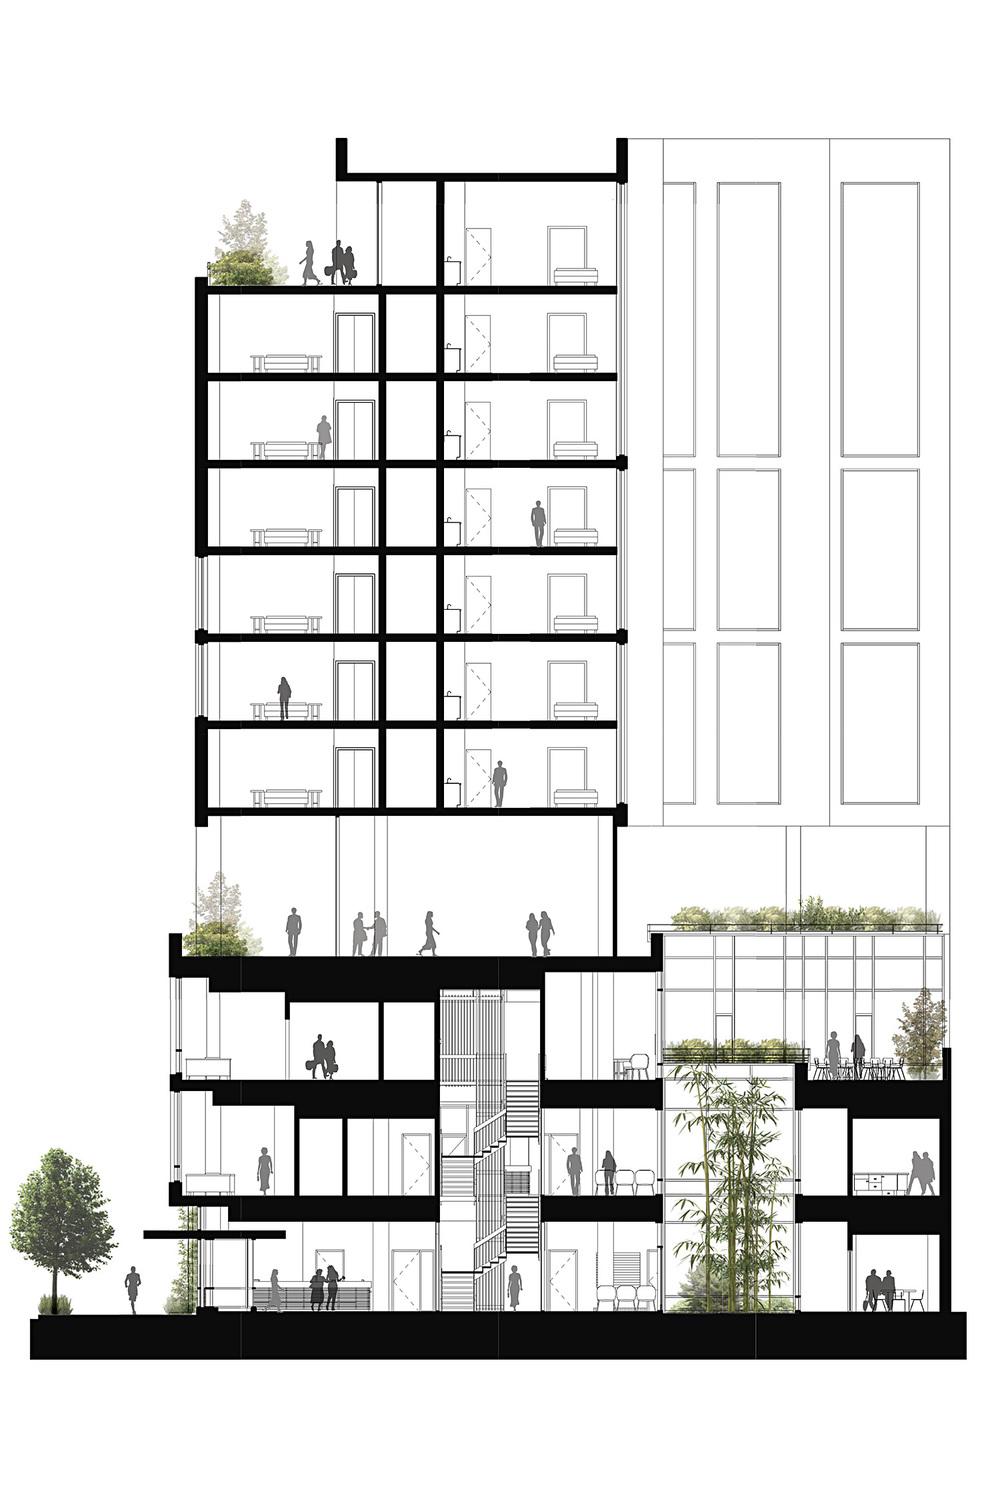 wOT future housing - SECTION.jpg